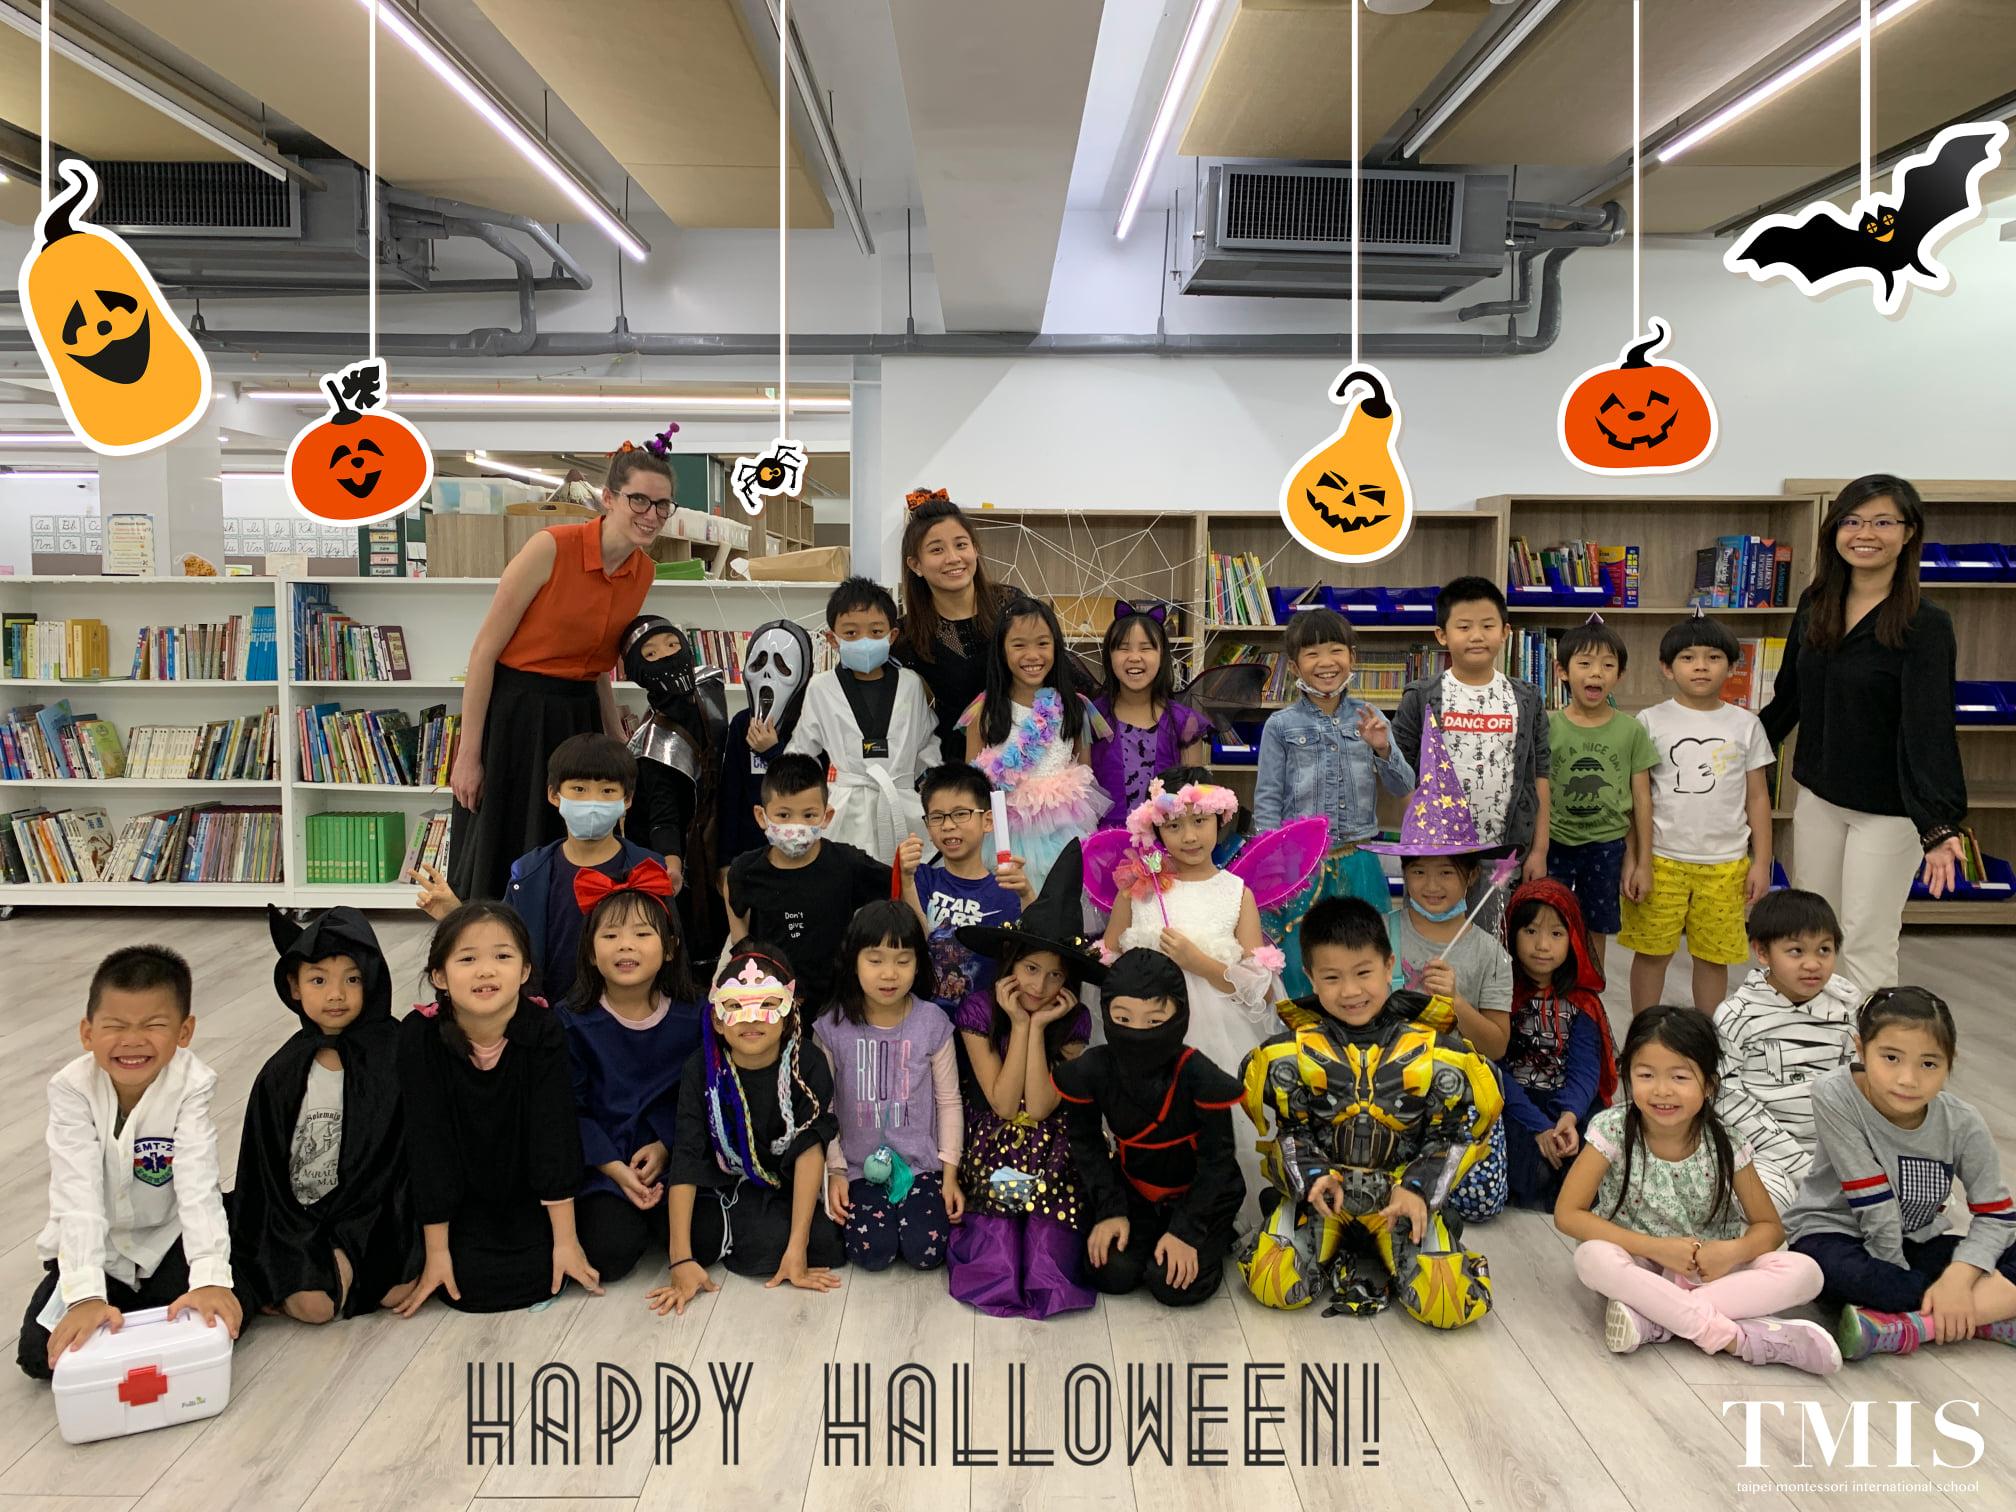 TMIS celebrates Halloween